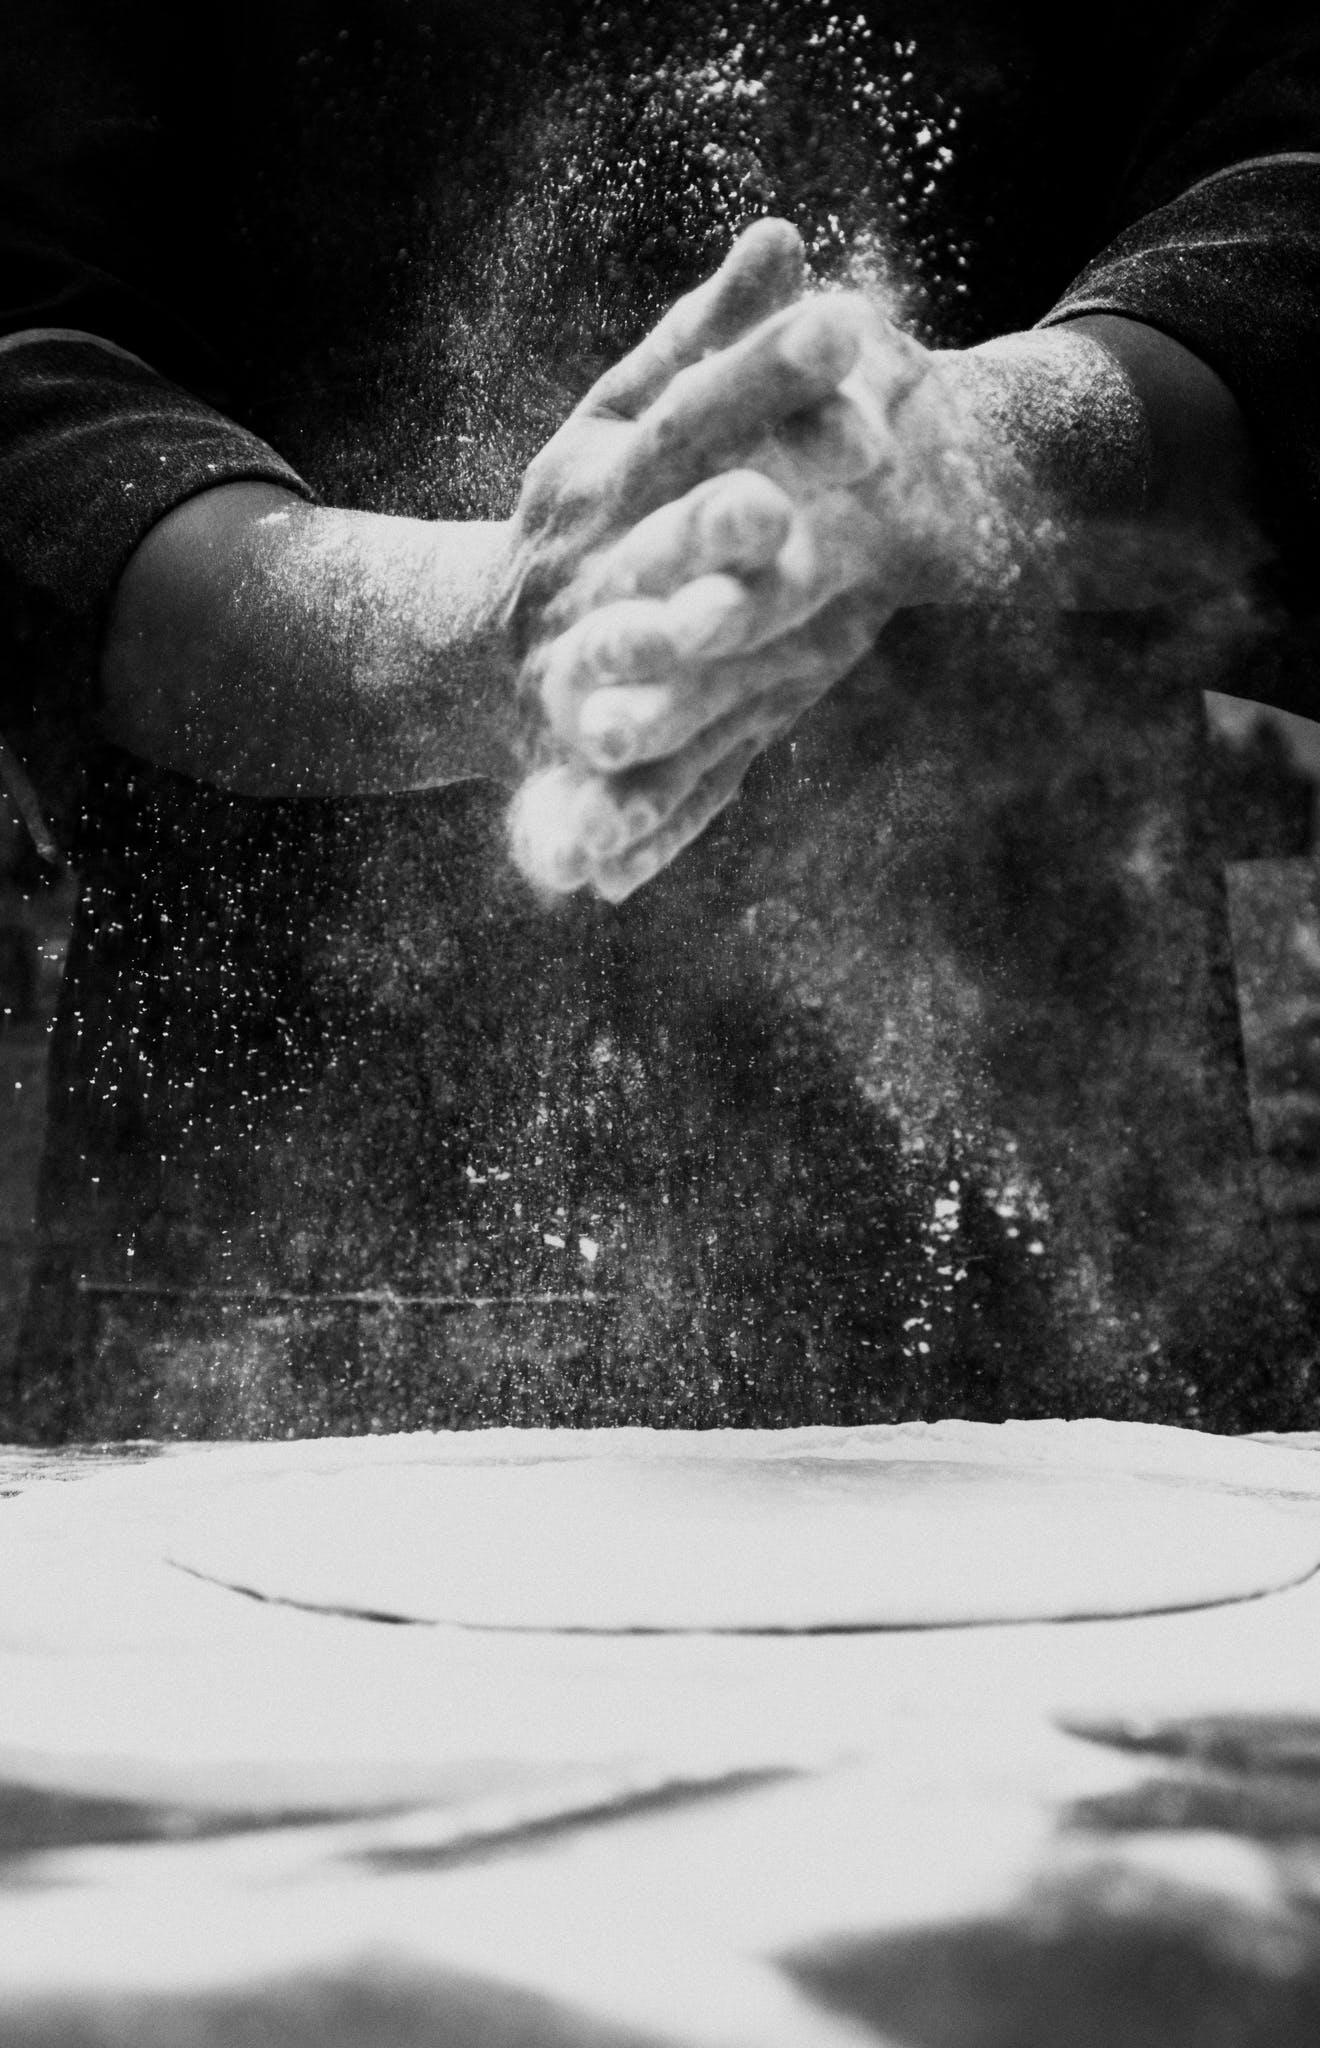 Person Spreading Flour